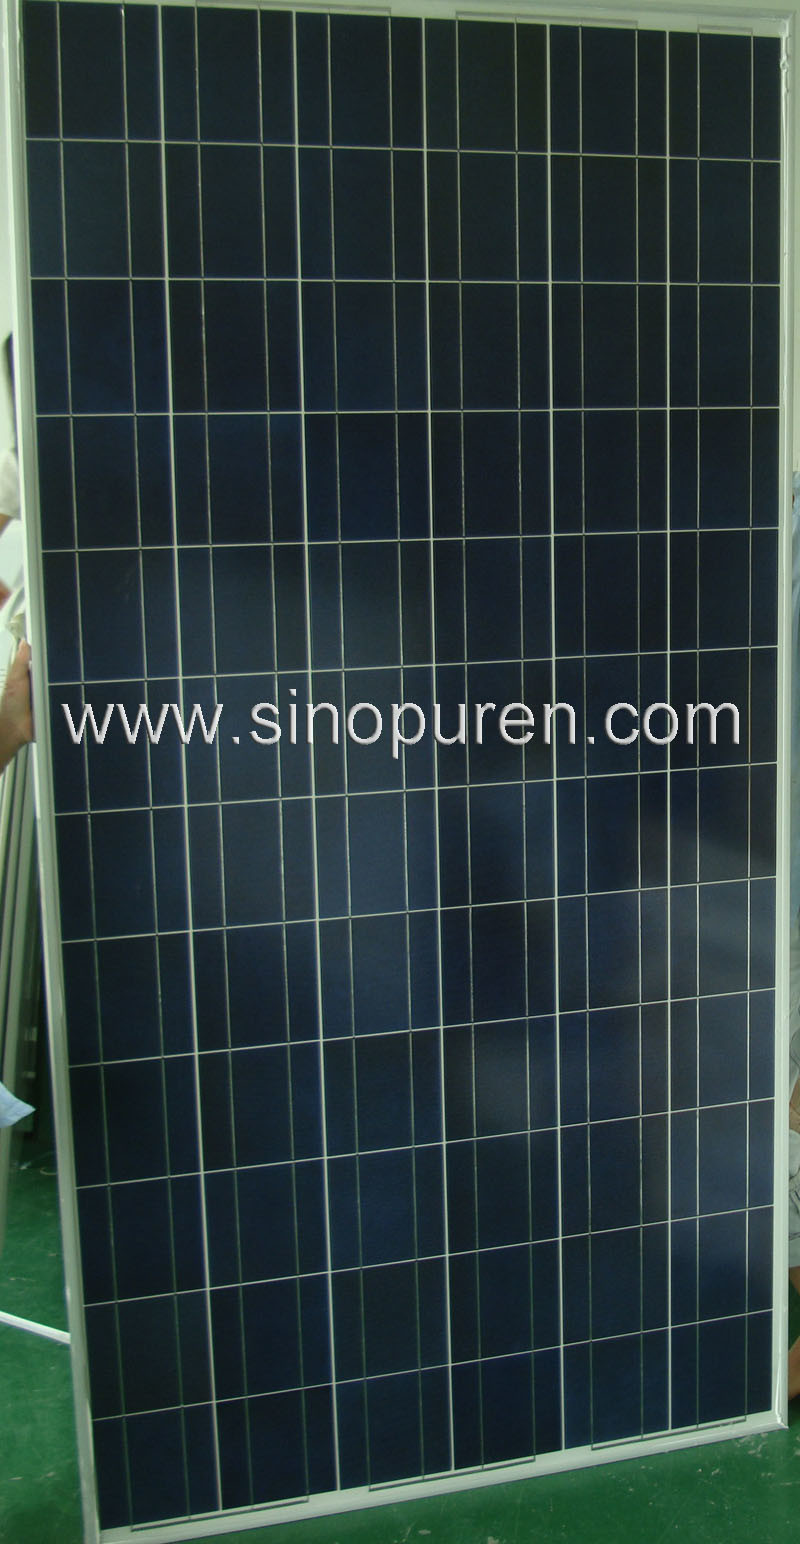 pv module 280 watt sl280ce 36p china pv module pv panel. Black Bedroom Furniture Sets. Home Design Ideas